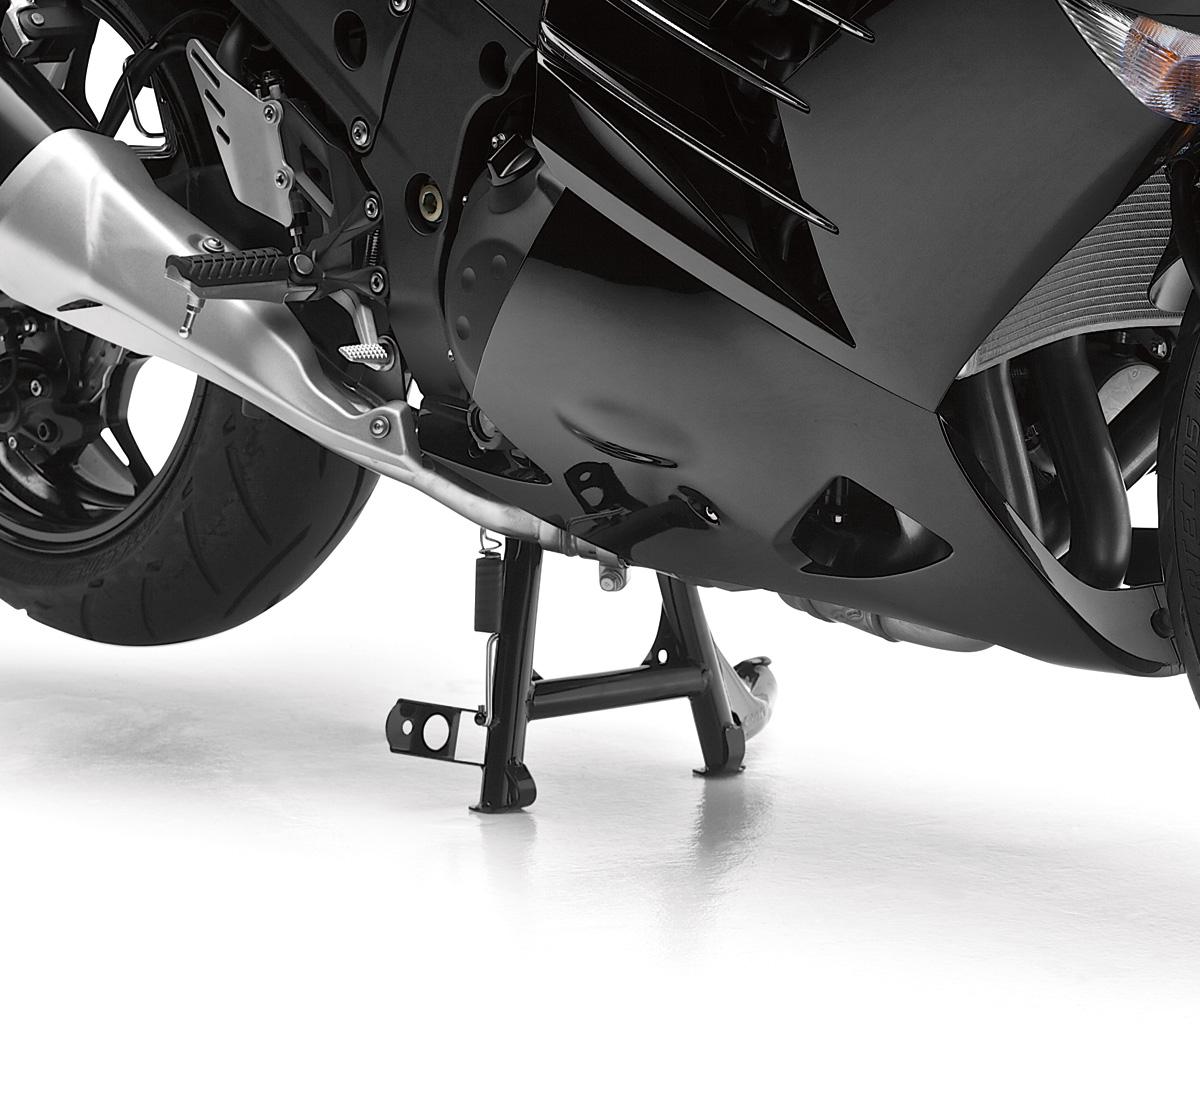 ZZR1400 Adjustable Center Stand T-Rex Racing 2012-2019 Kawasaki ZX-14R